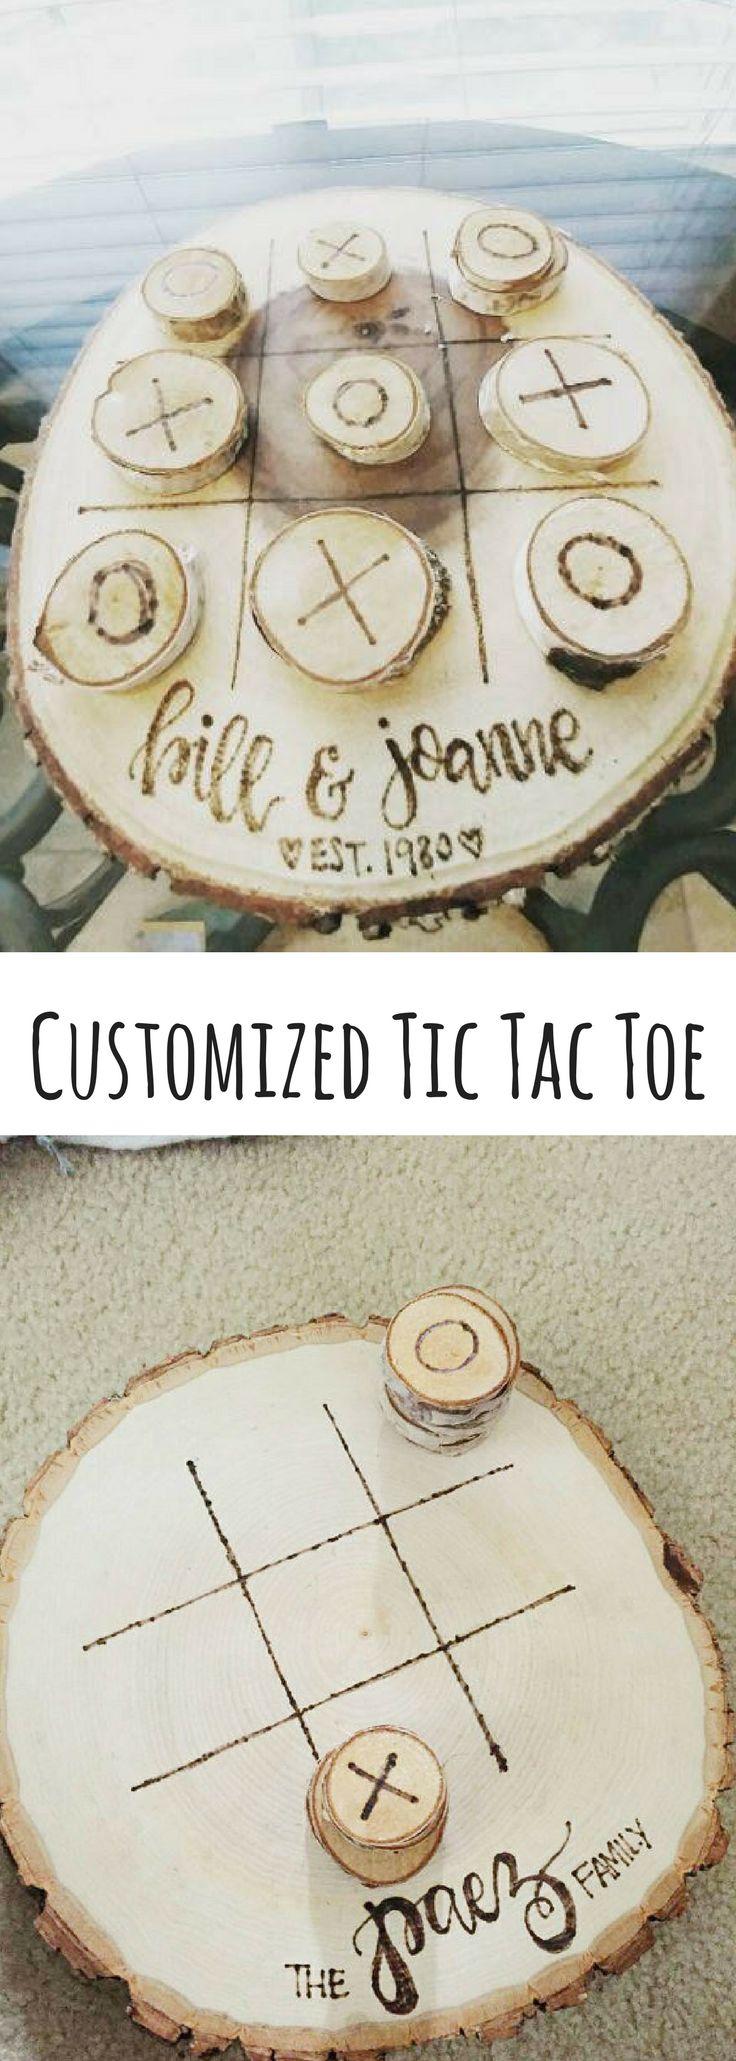 Tic Tac Toe Personalized Wood Burned Art on Large Thick Wood Round Rustic Home Decor Shabby Chic Farmhouse Family Name Wedding Valentine #affiliatelink